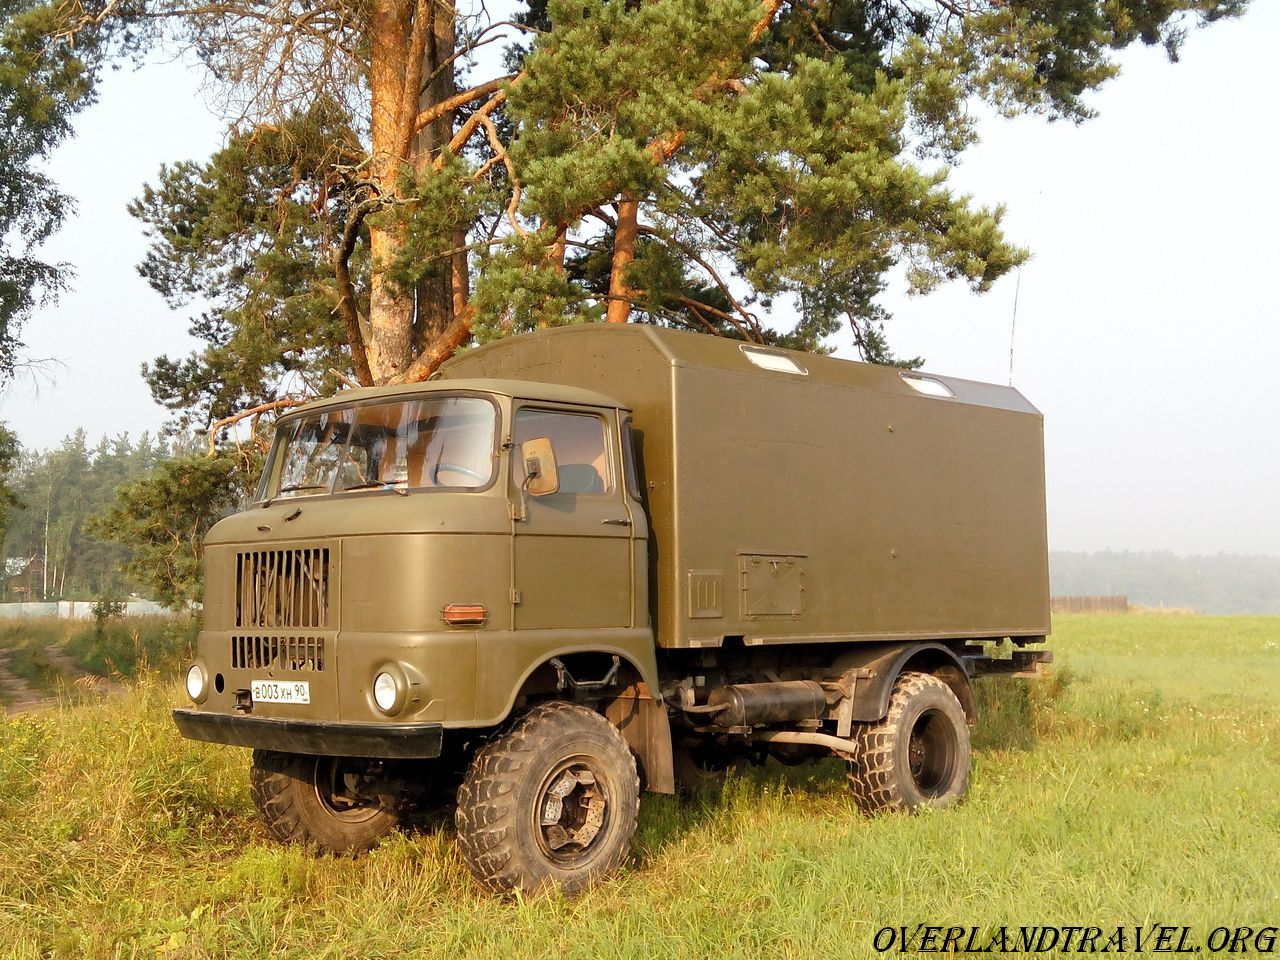 IFA-W50LA 4x4 army truck production GDR, IFA-W50